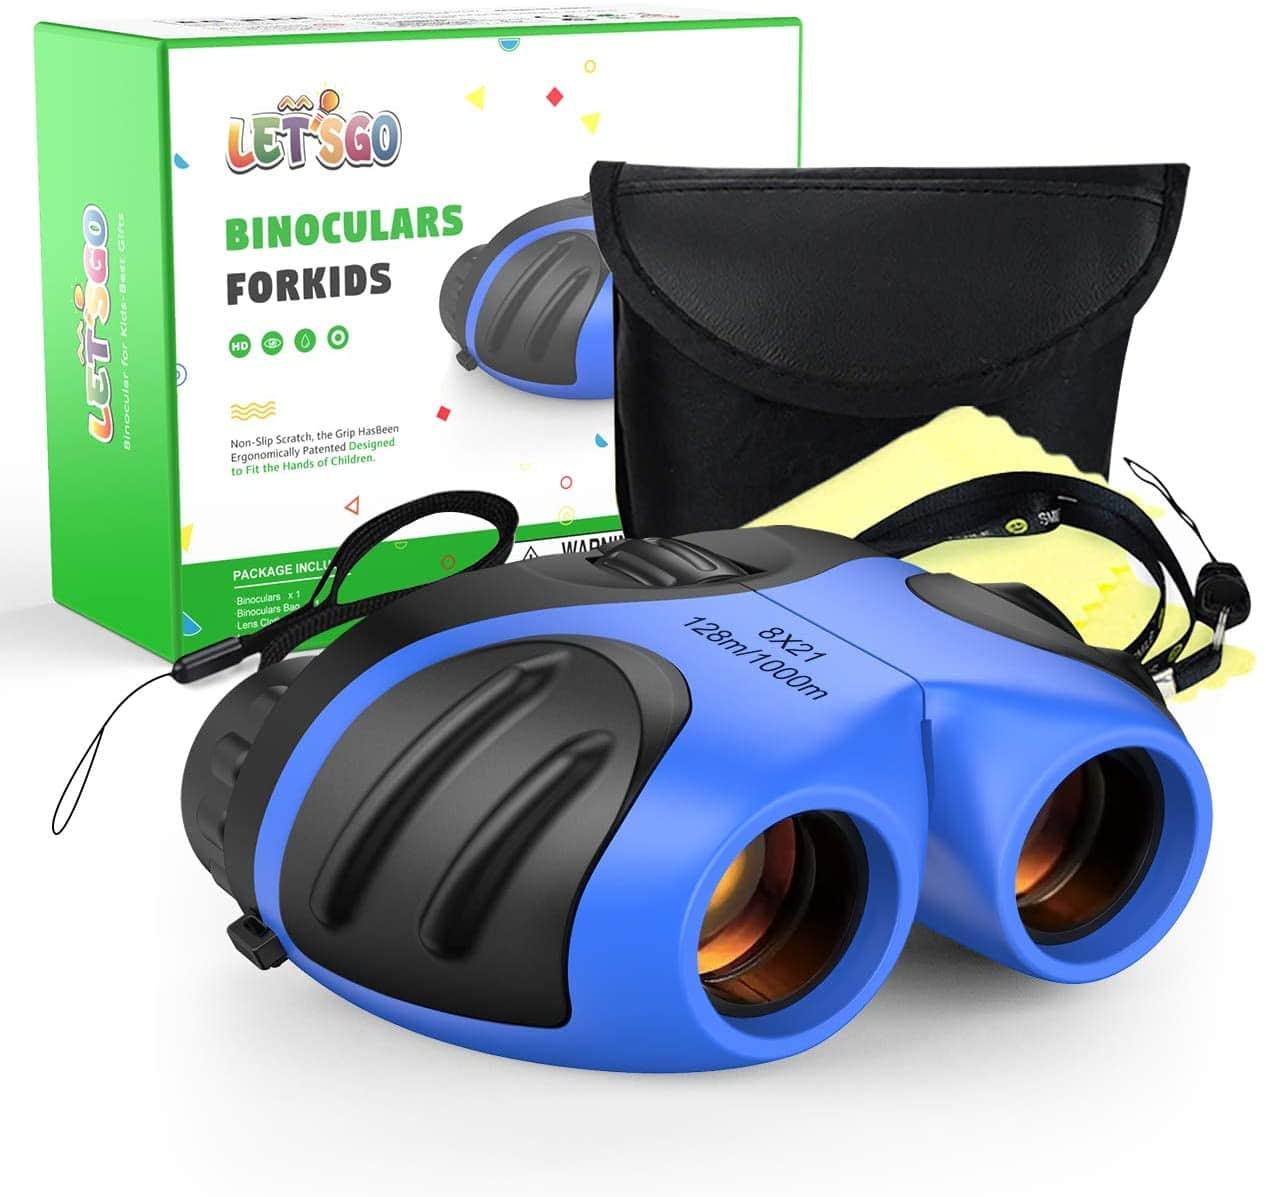 Compact Telescope Binoculars by DMBaby.